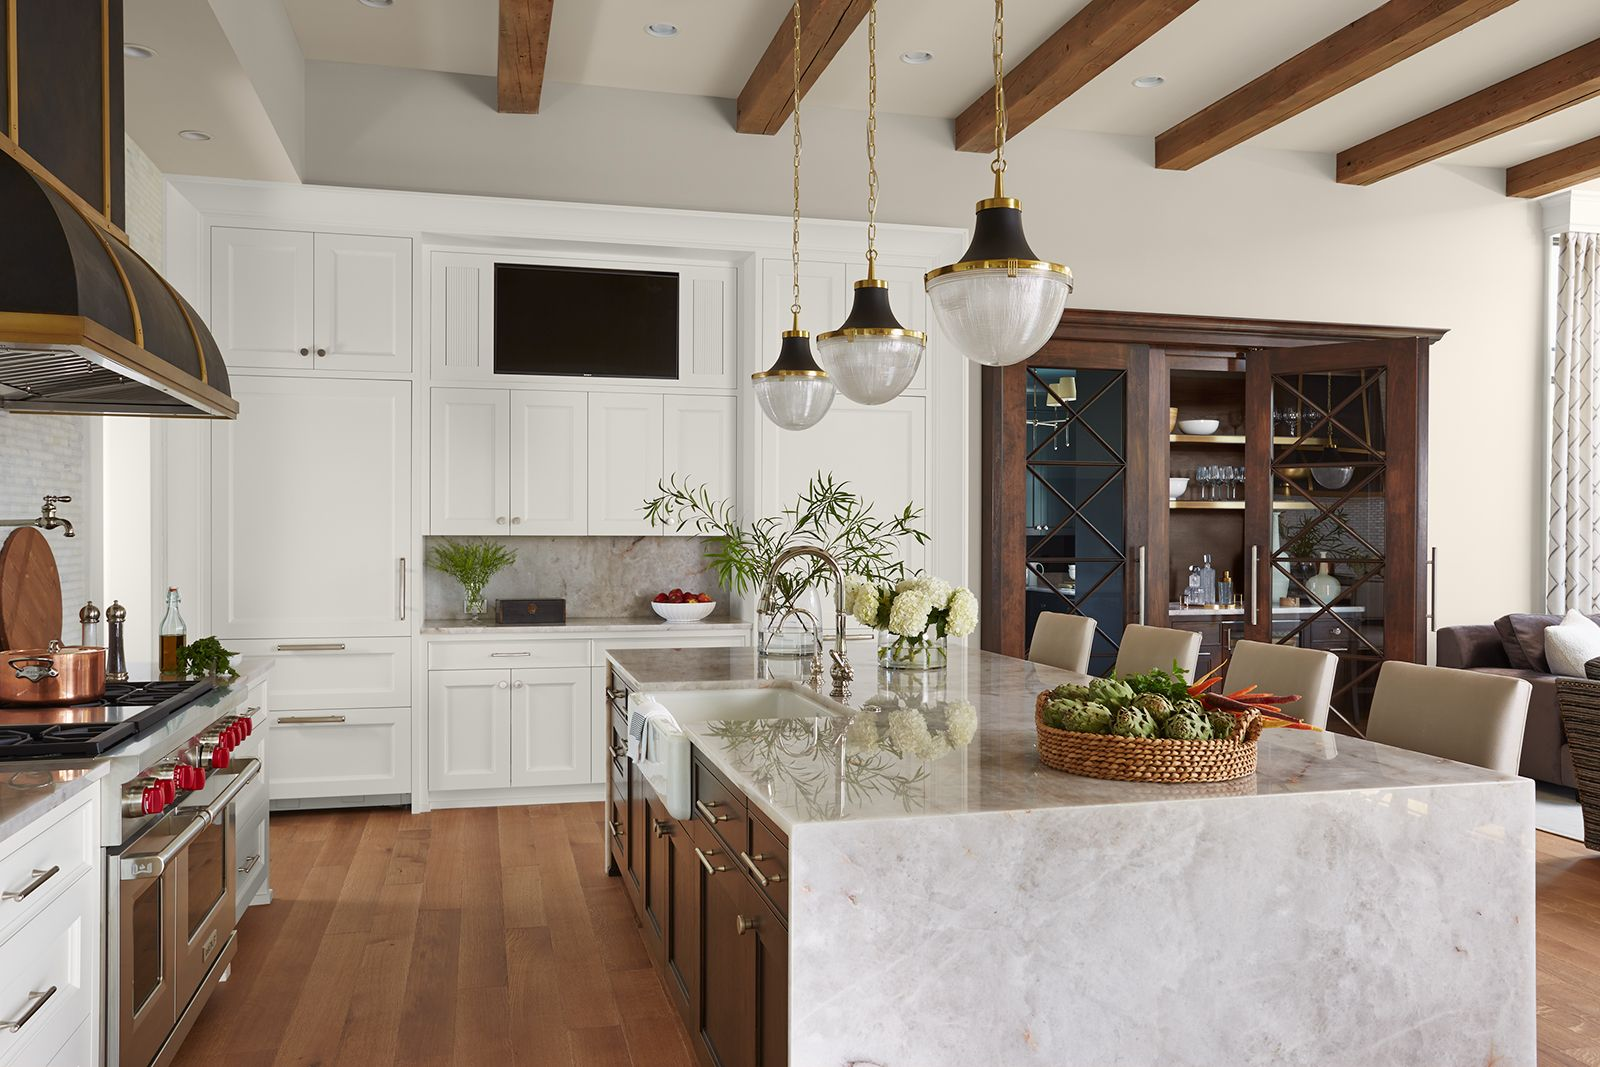 modern english tudor by vivid interior design and hendel homes home decor kitchen luxury on kitchen interior luxury id=19410